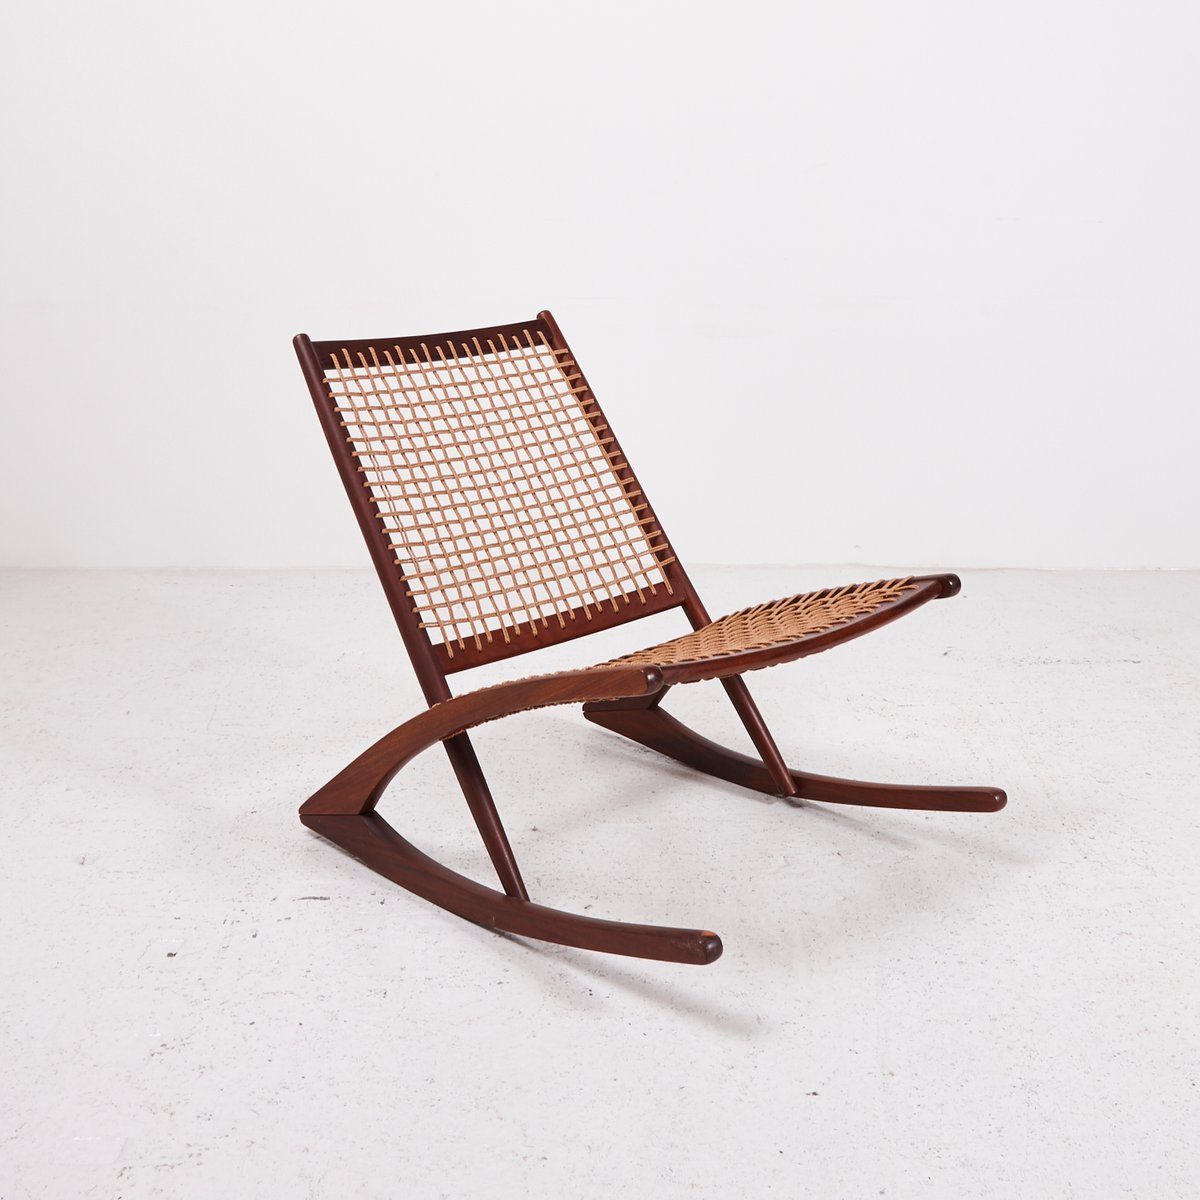 Vintage rattan rocking chair - Vintage Teak Rocking Chair With Paper Cord